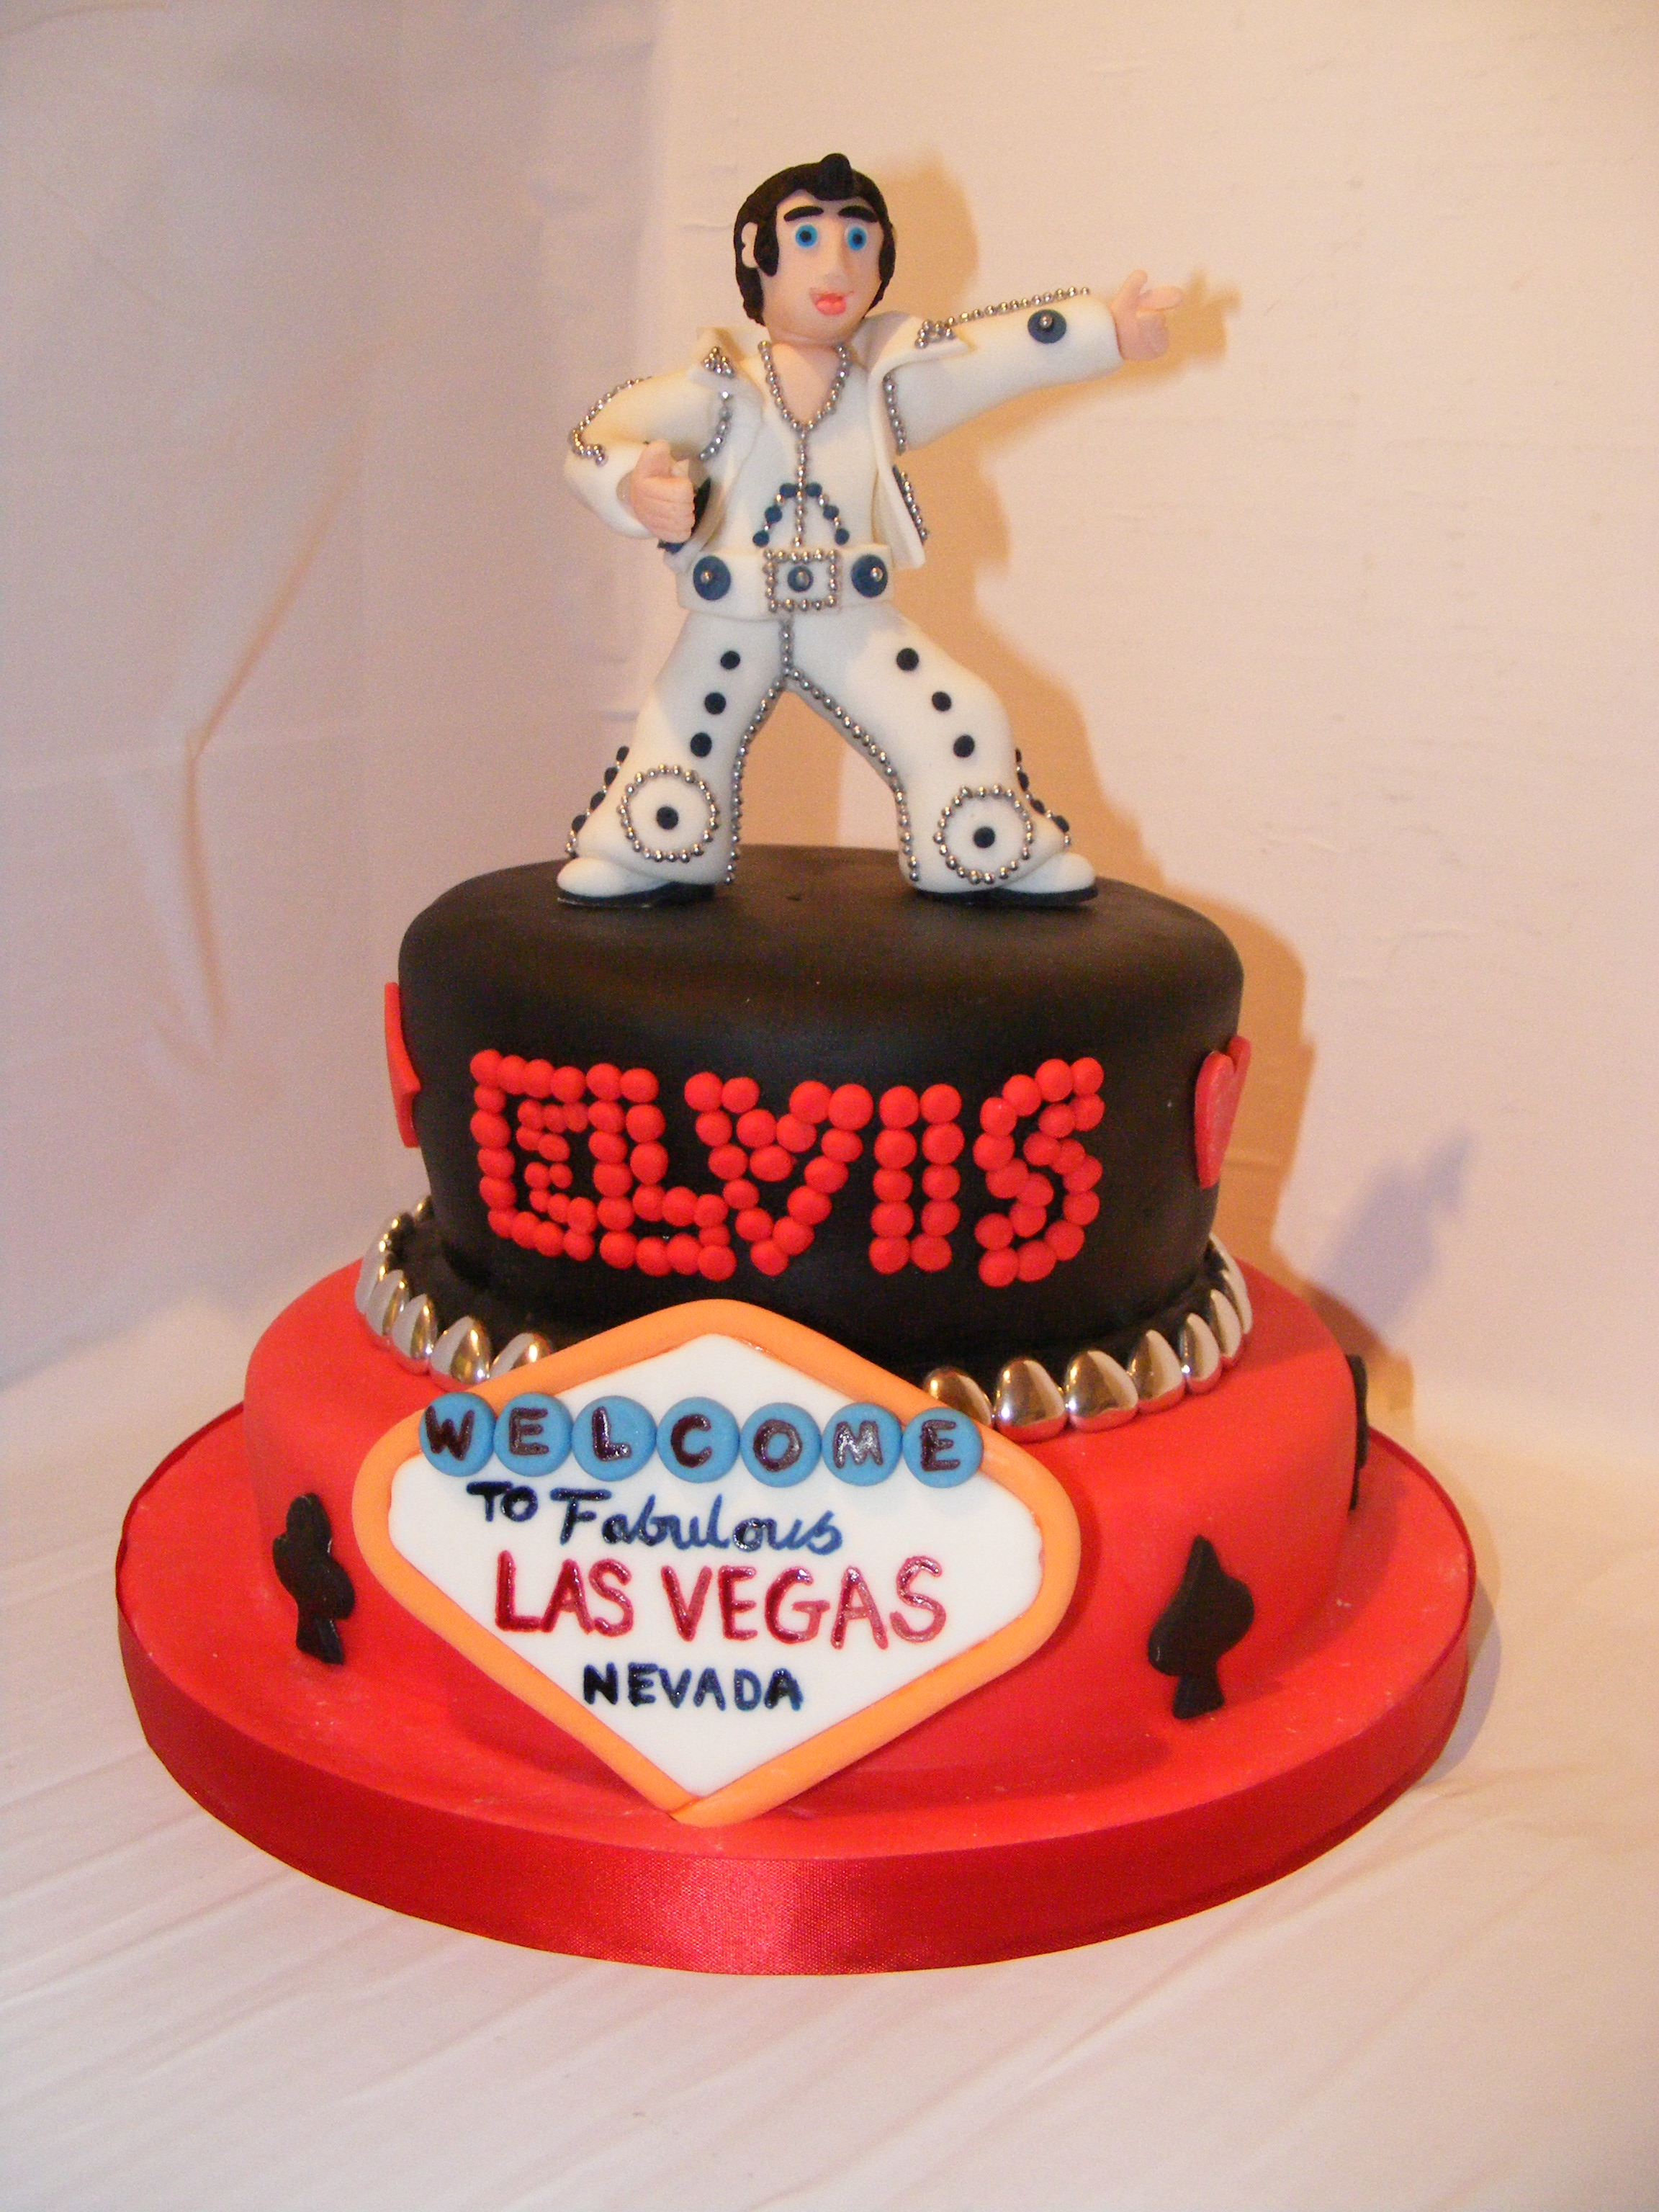 Fantastic 11 Elvis Birthday Cakes 3 Tear Photo Elvis Birthday Cake Elvis Birthday Cards Printable Opercafe Filternl